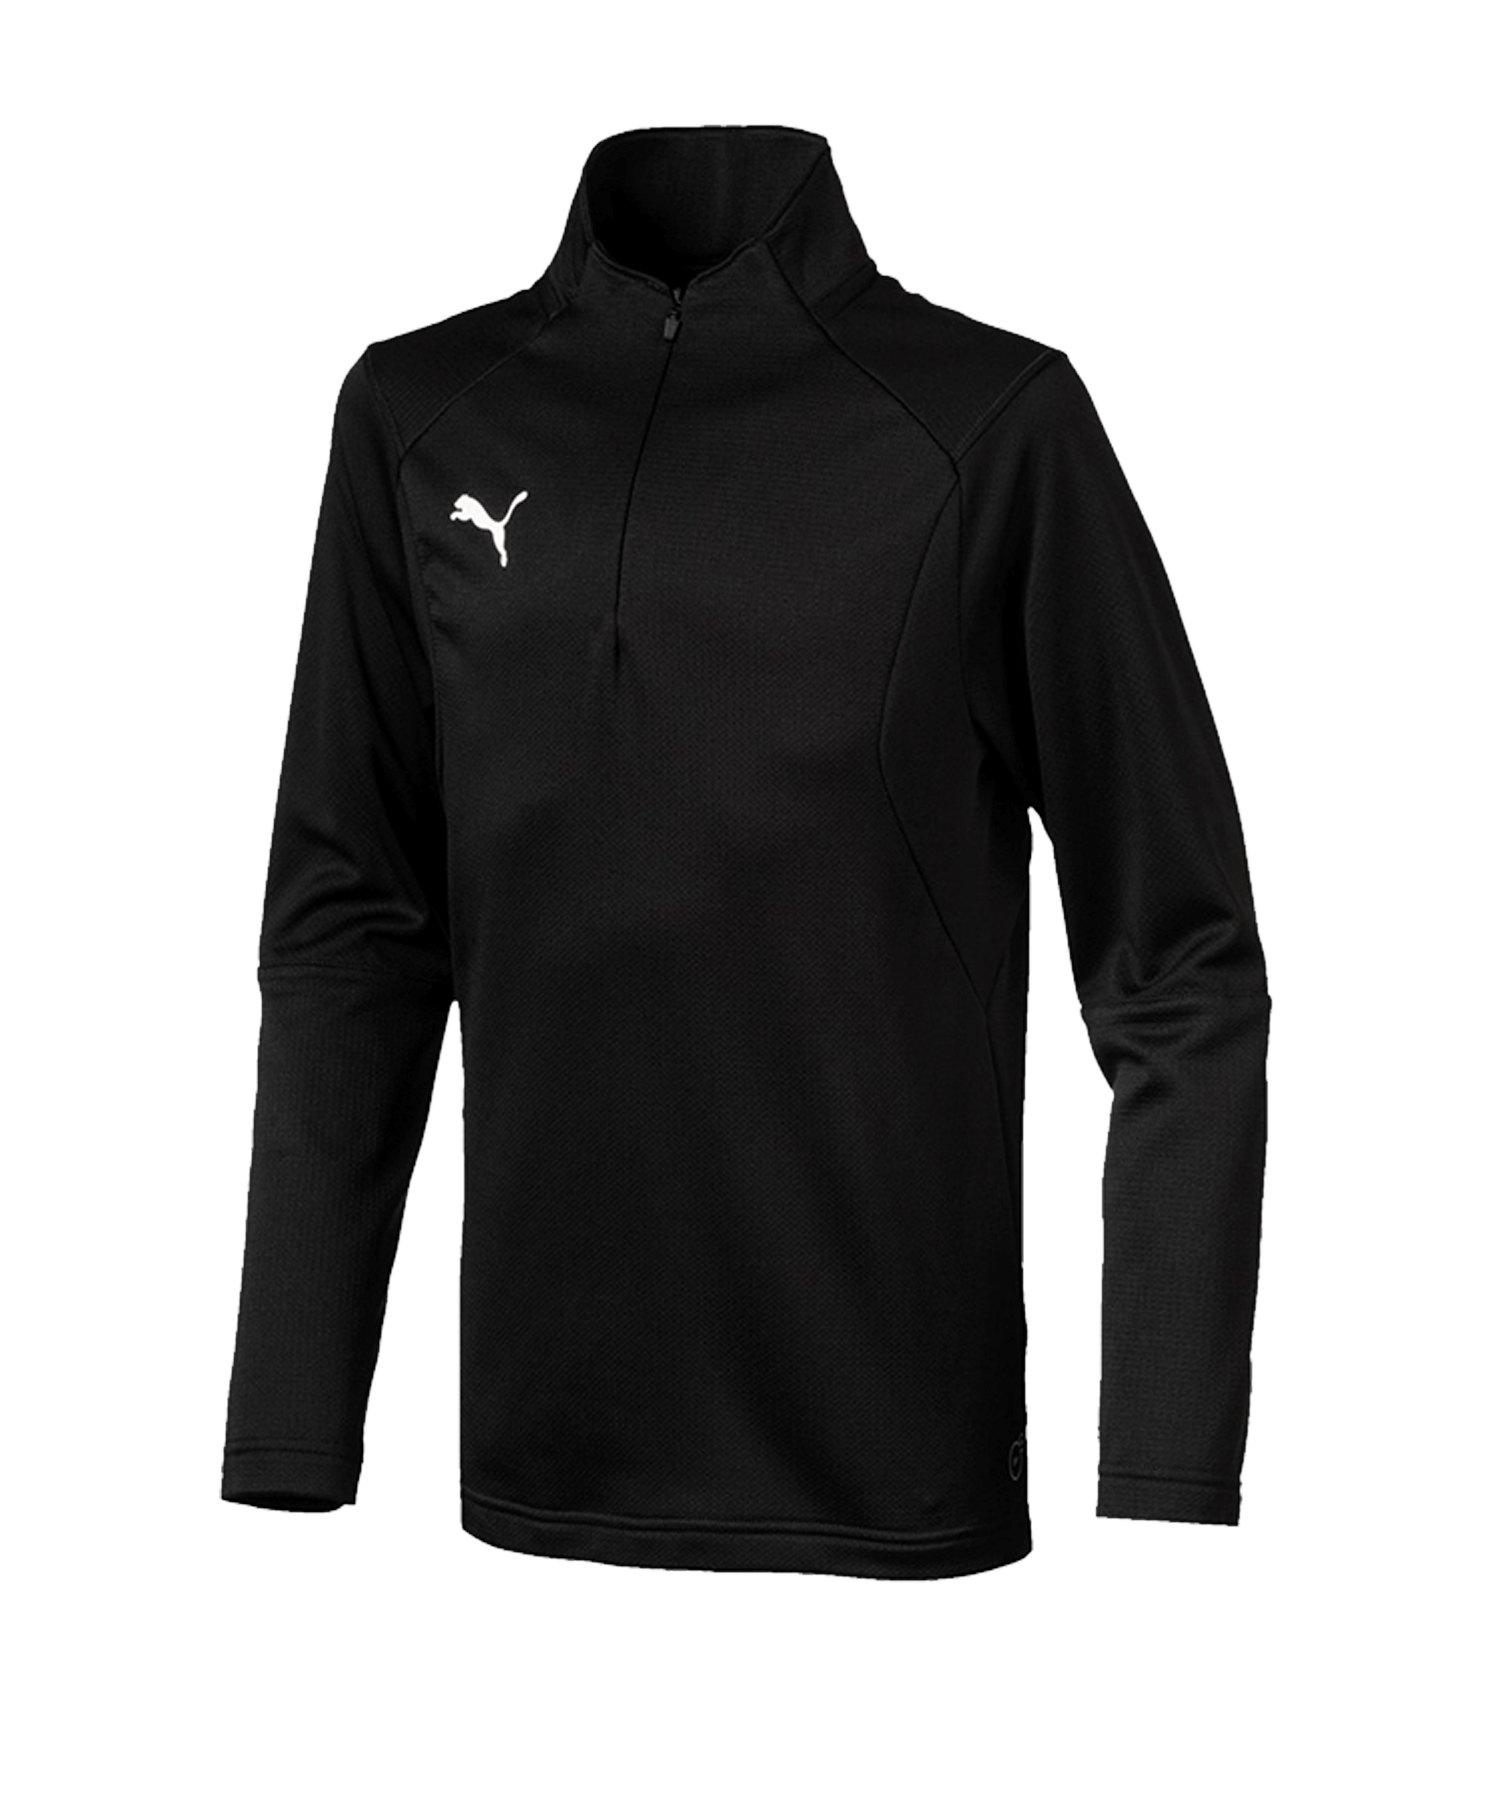 PUMA LIGA Training 1/4 Zip Top Sweatshirt Kids F03 - schwarz